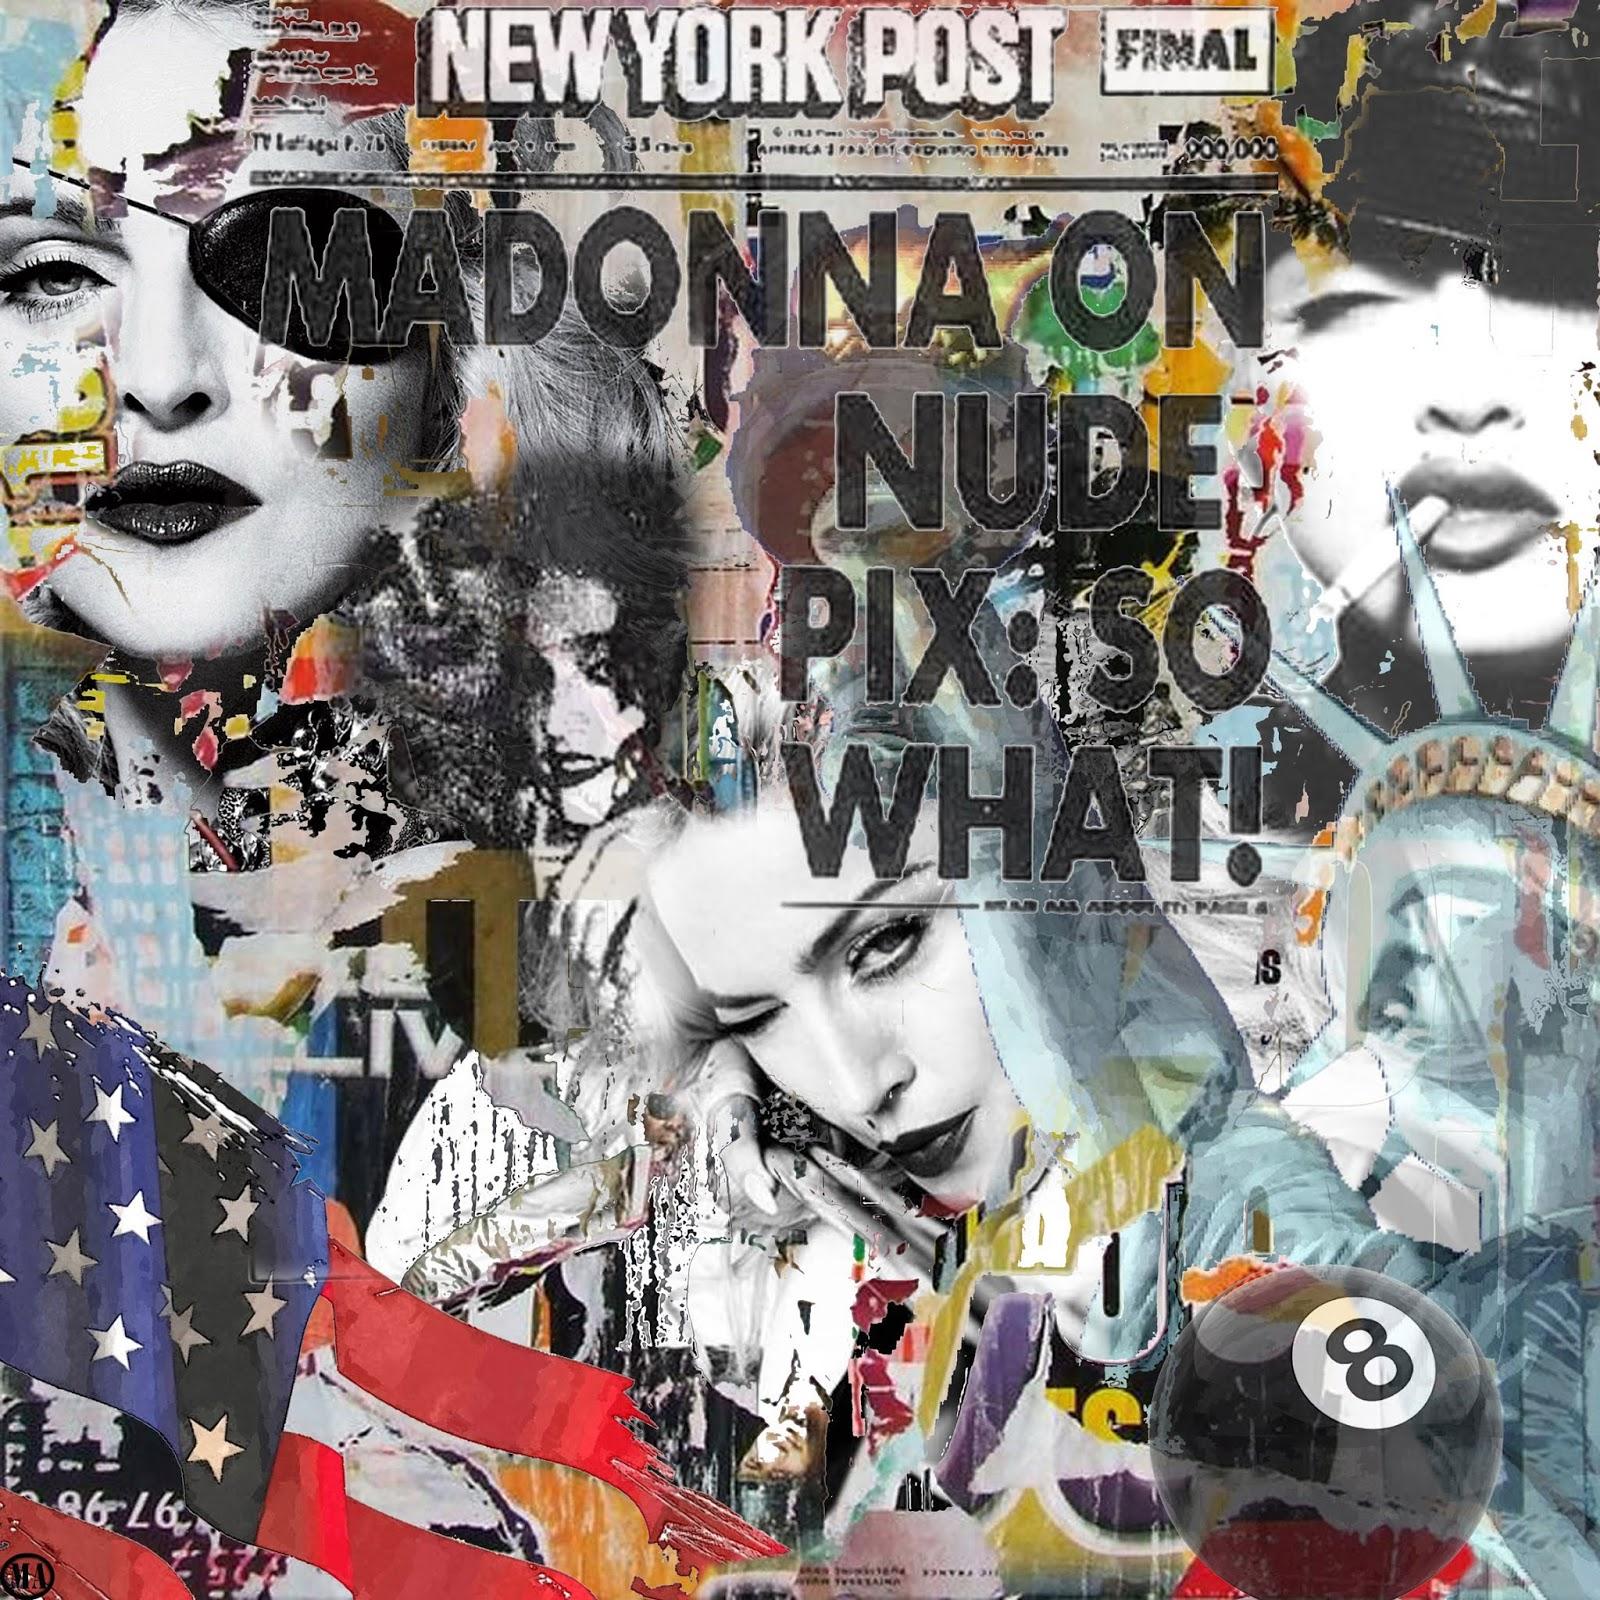 Artraum Mosimo Galerie Kunstgalerie The Pop Art Queen Madonna